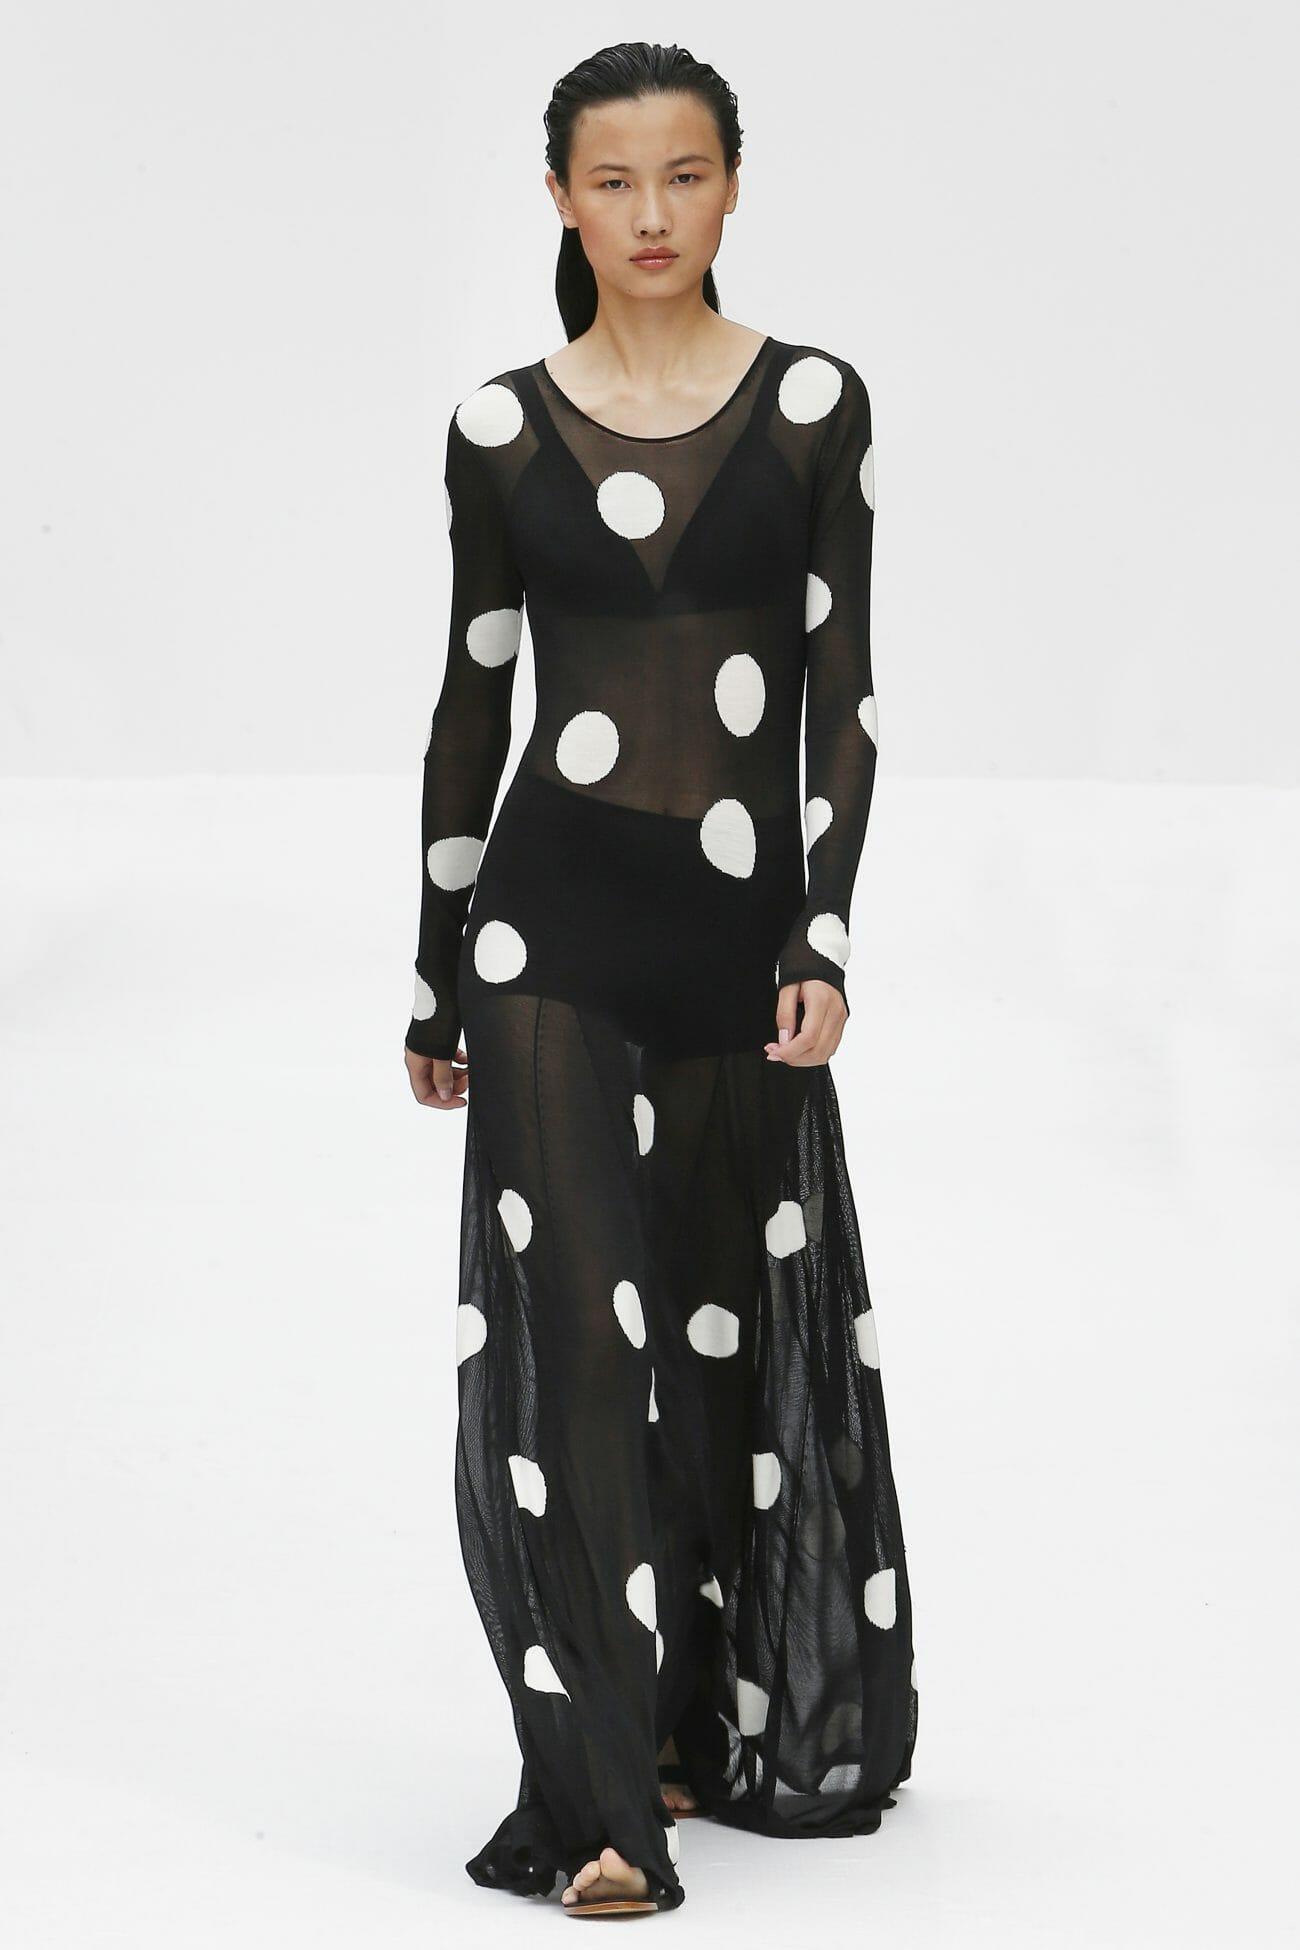 Carolina Herrera New York polka dots black dress